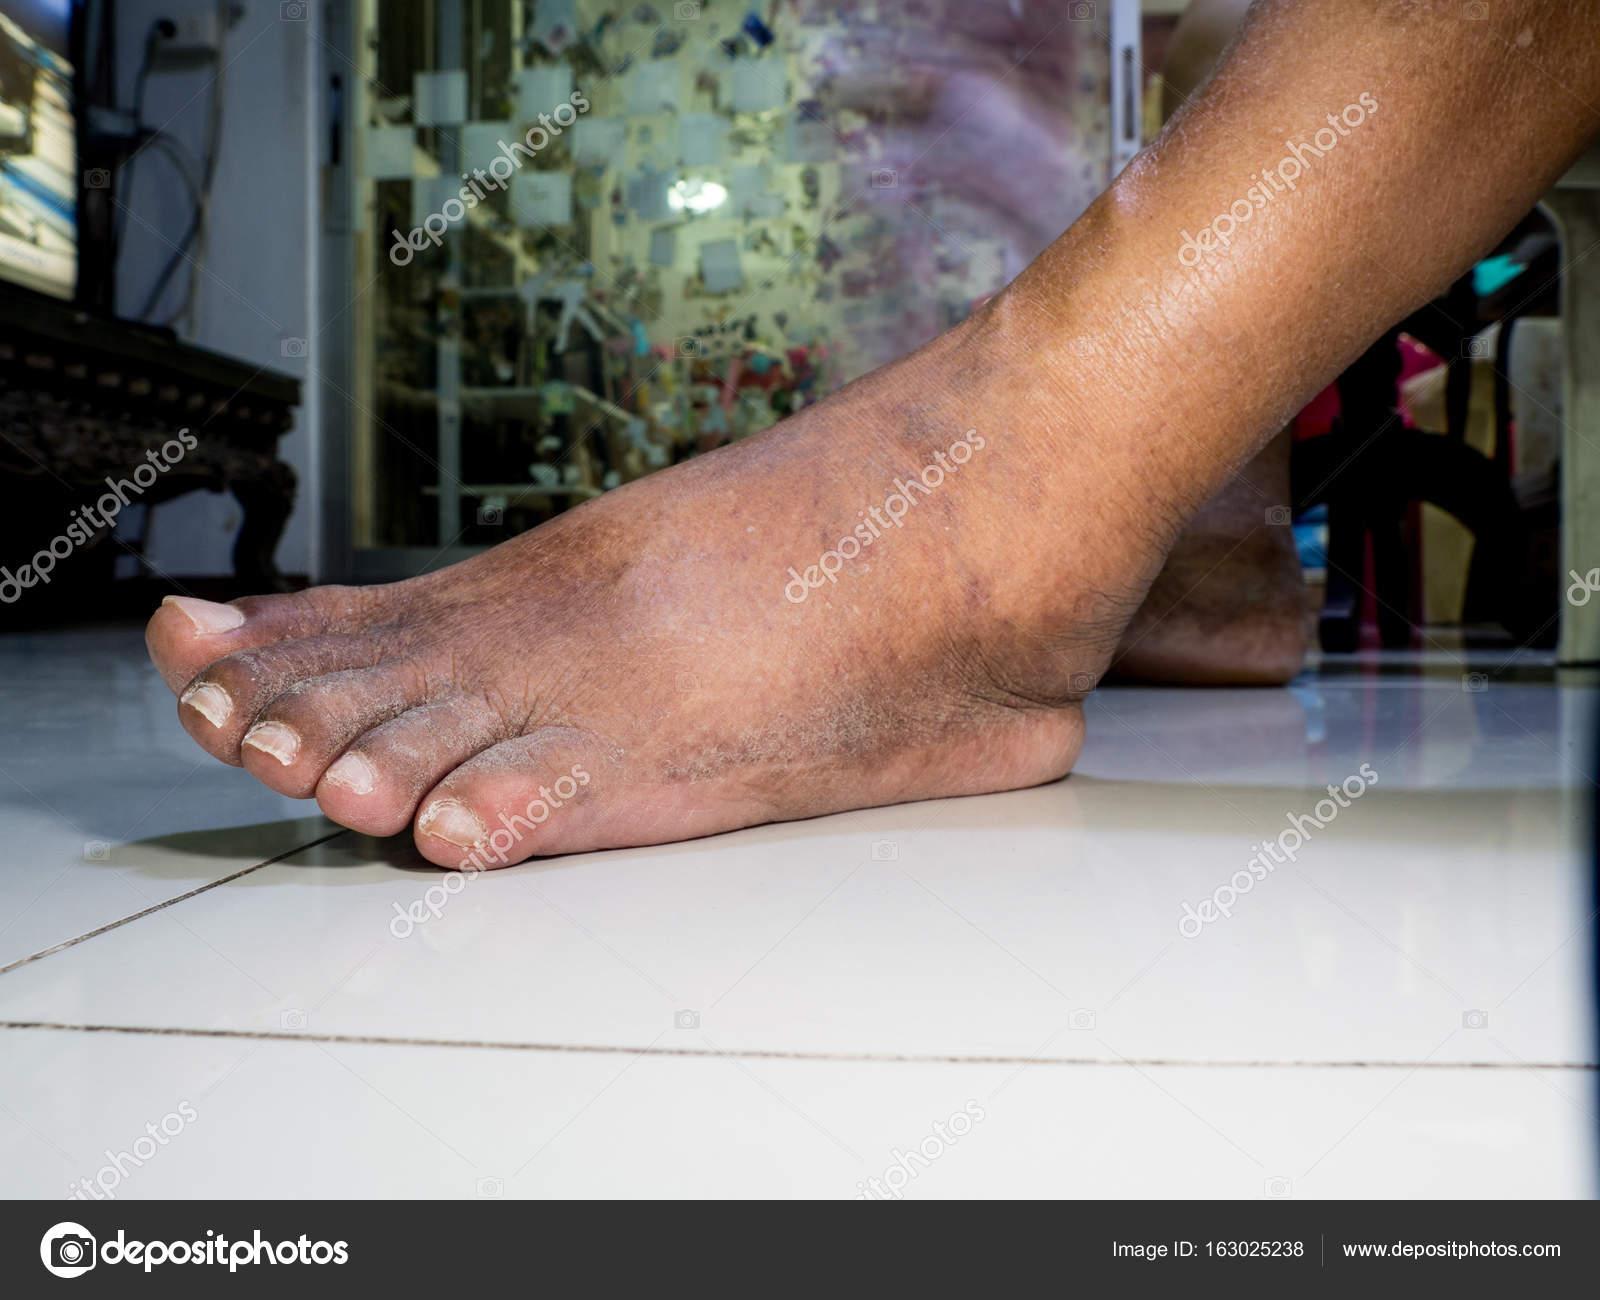 Dr. Diag - Rheumatoid arthritis (korai stádium)